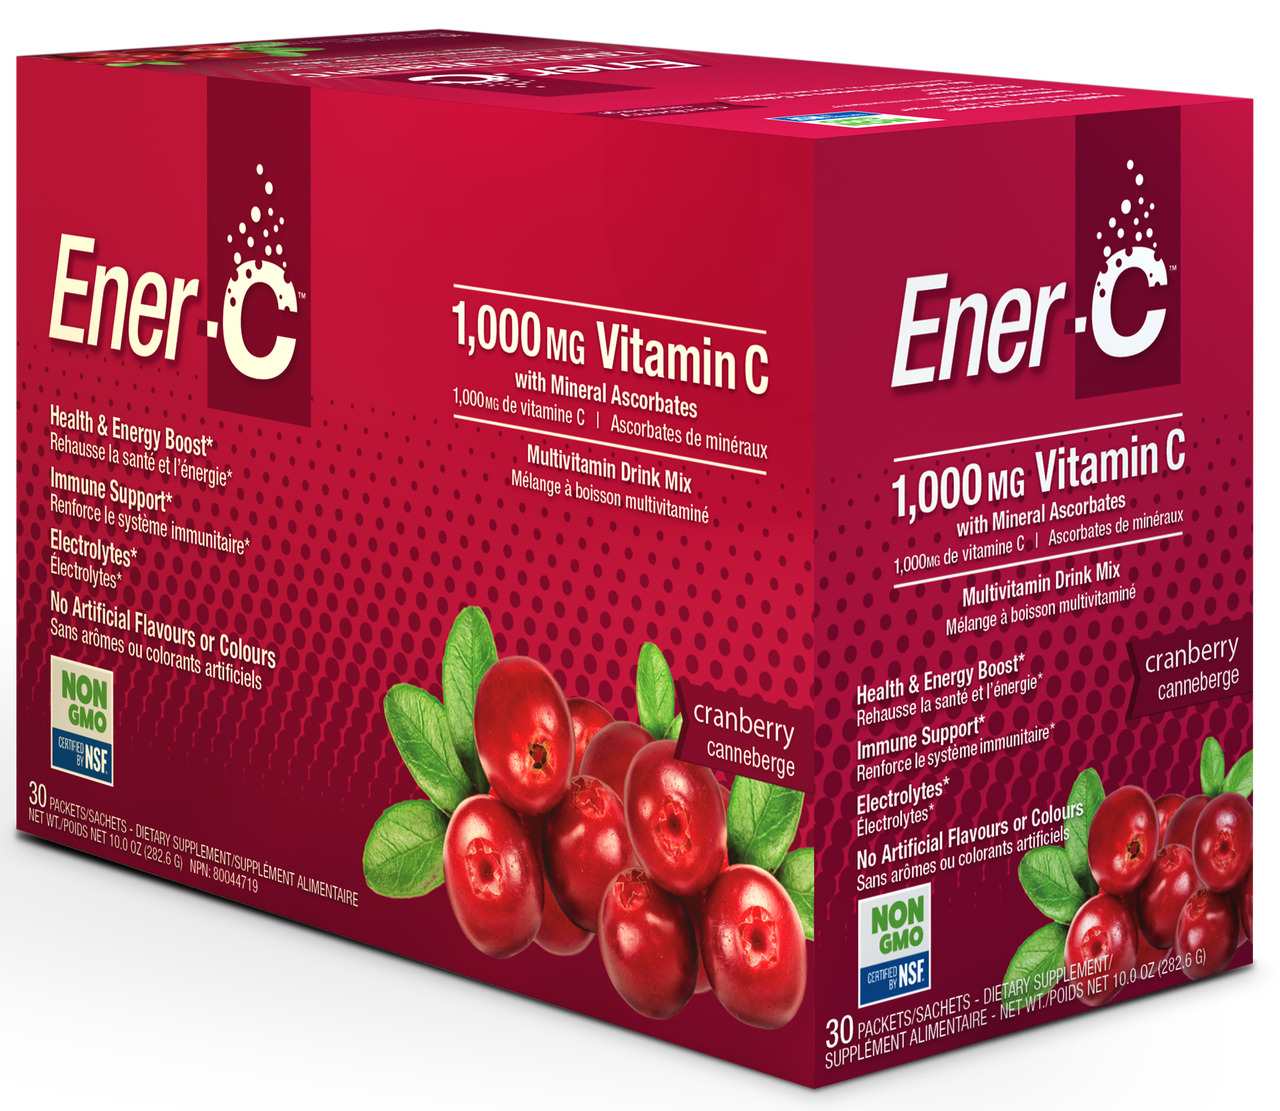 ener-c cranberry logo